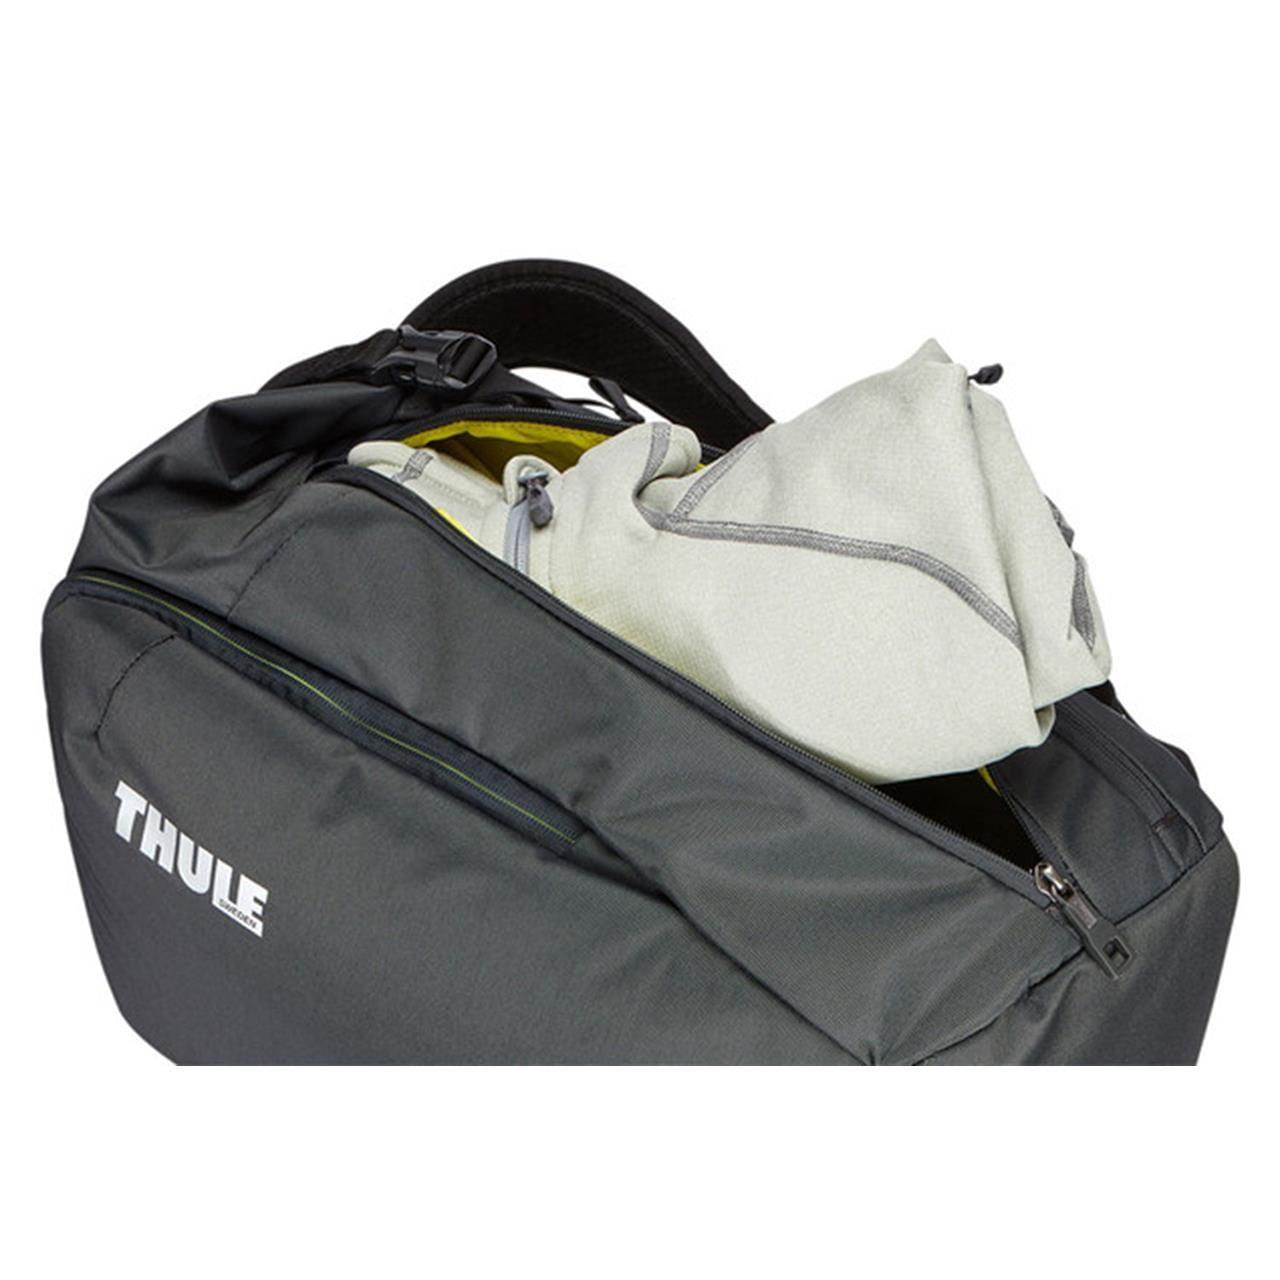 Rucsac urban cu compartiment laptop Thule Subterra Travel Backpack 34L Dark Shadow 2